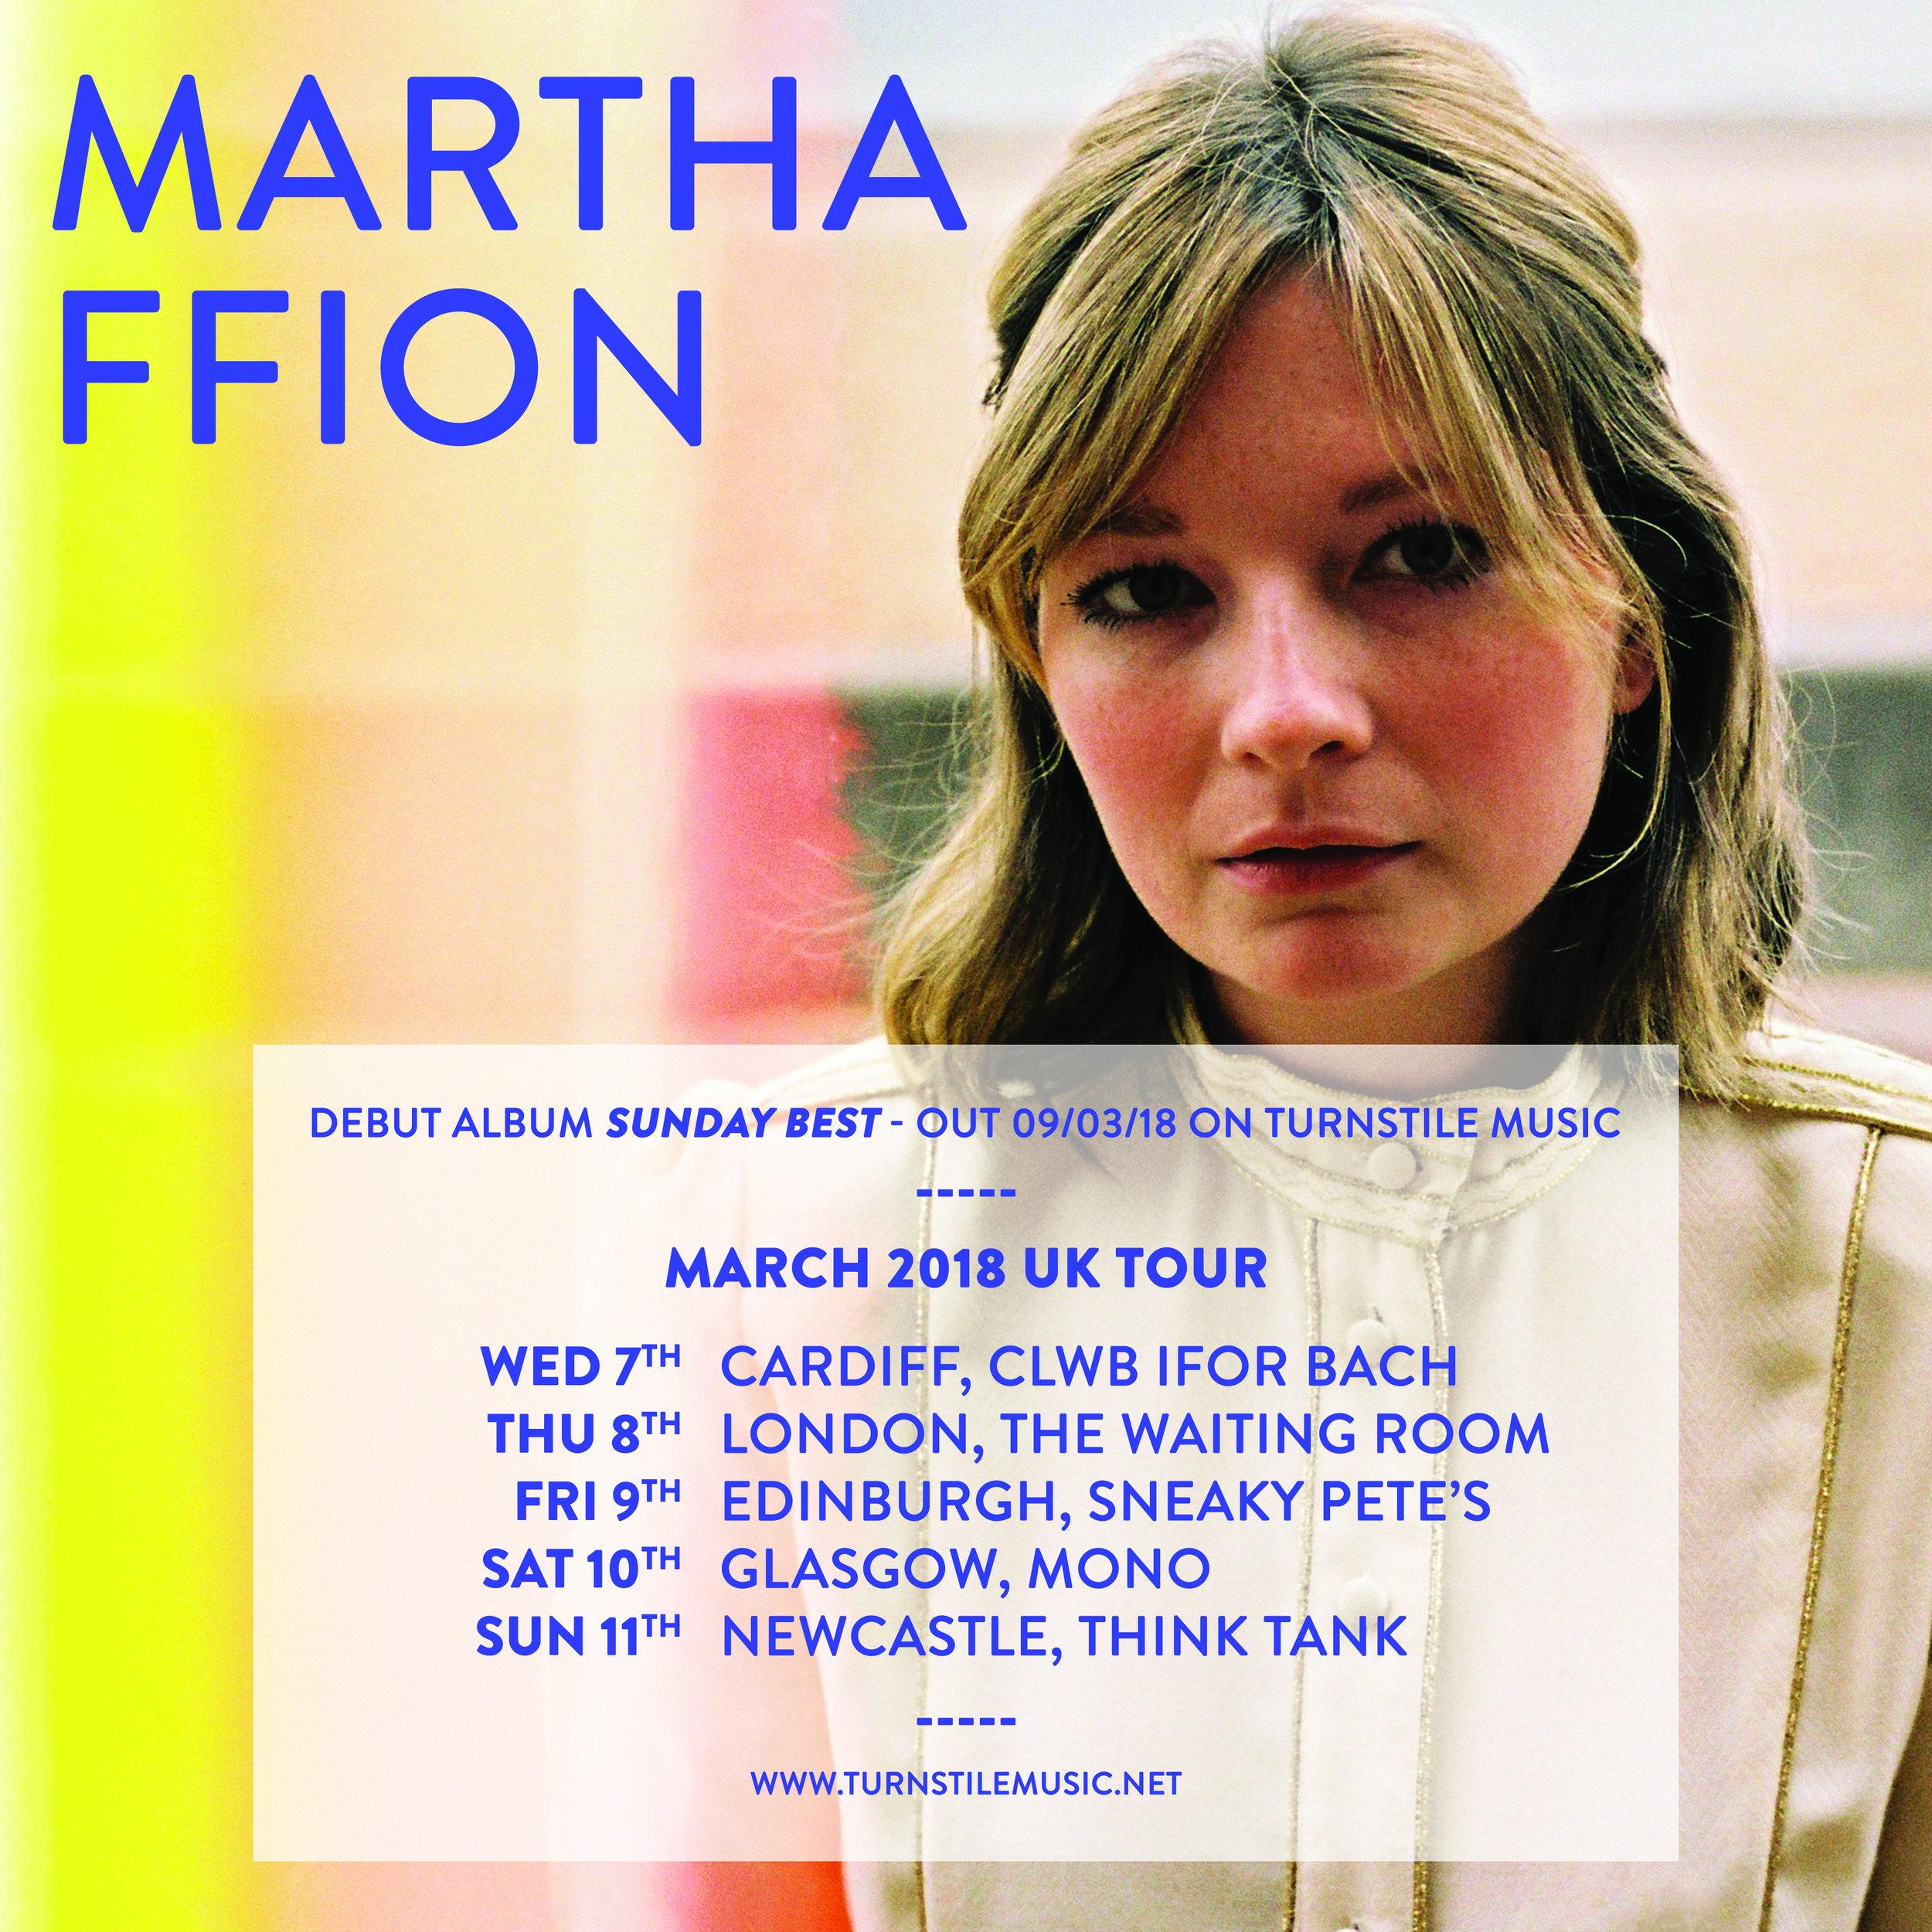 Martha Ffion March 2018 Tour INSTA.jpg